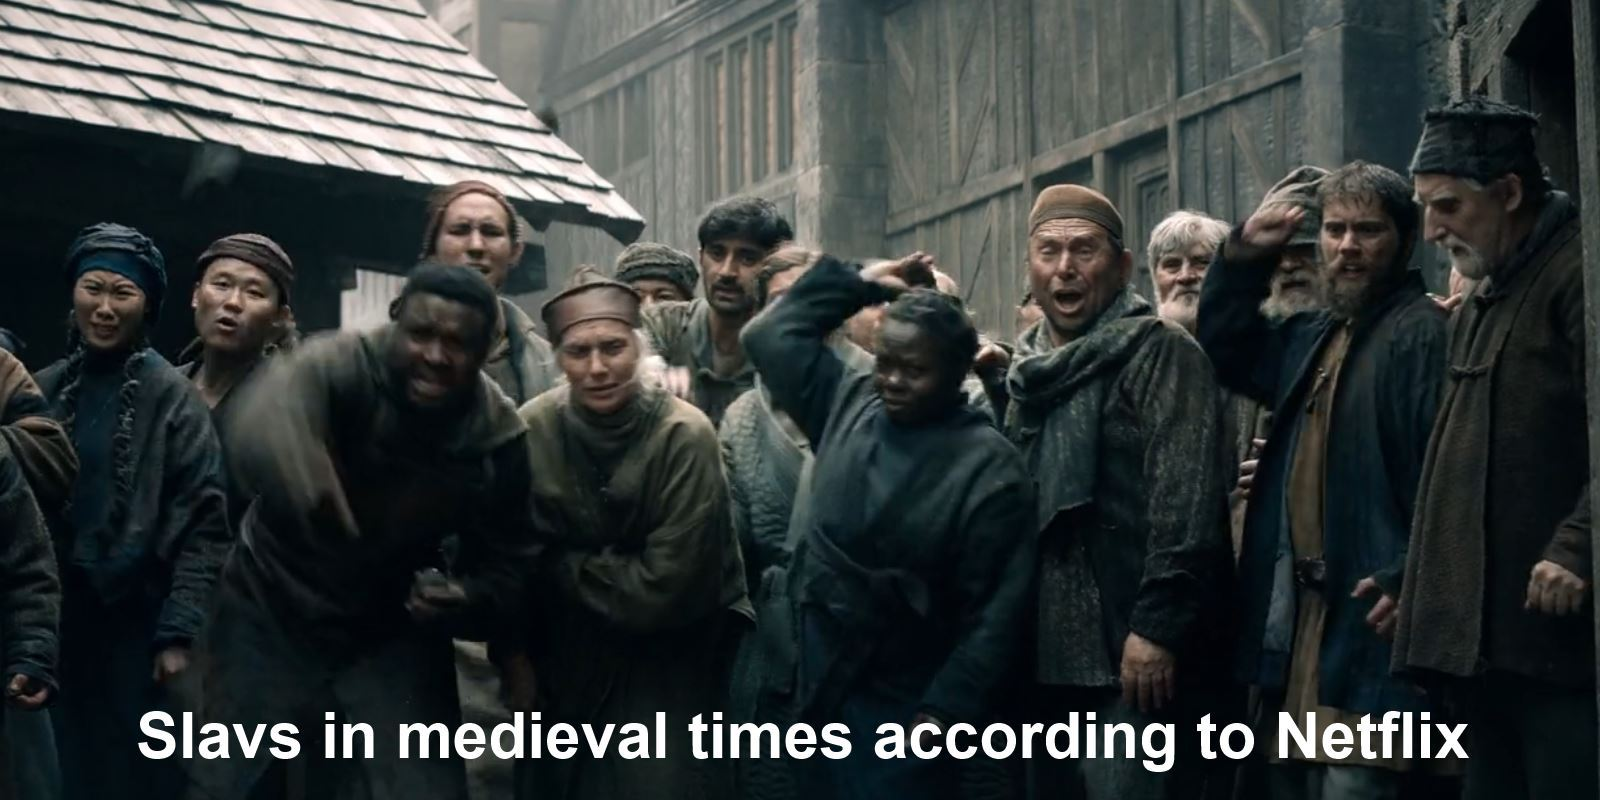 Slavs according to Netflix - meme